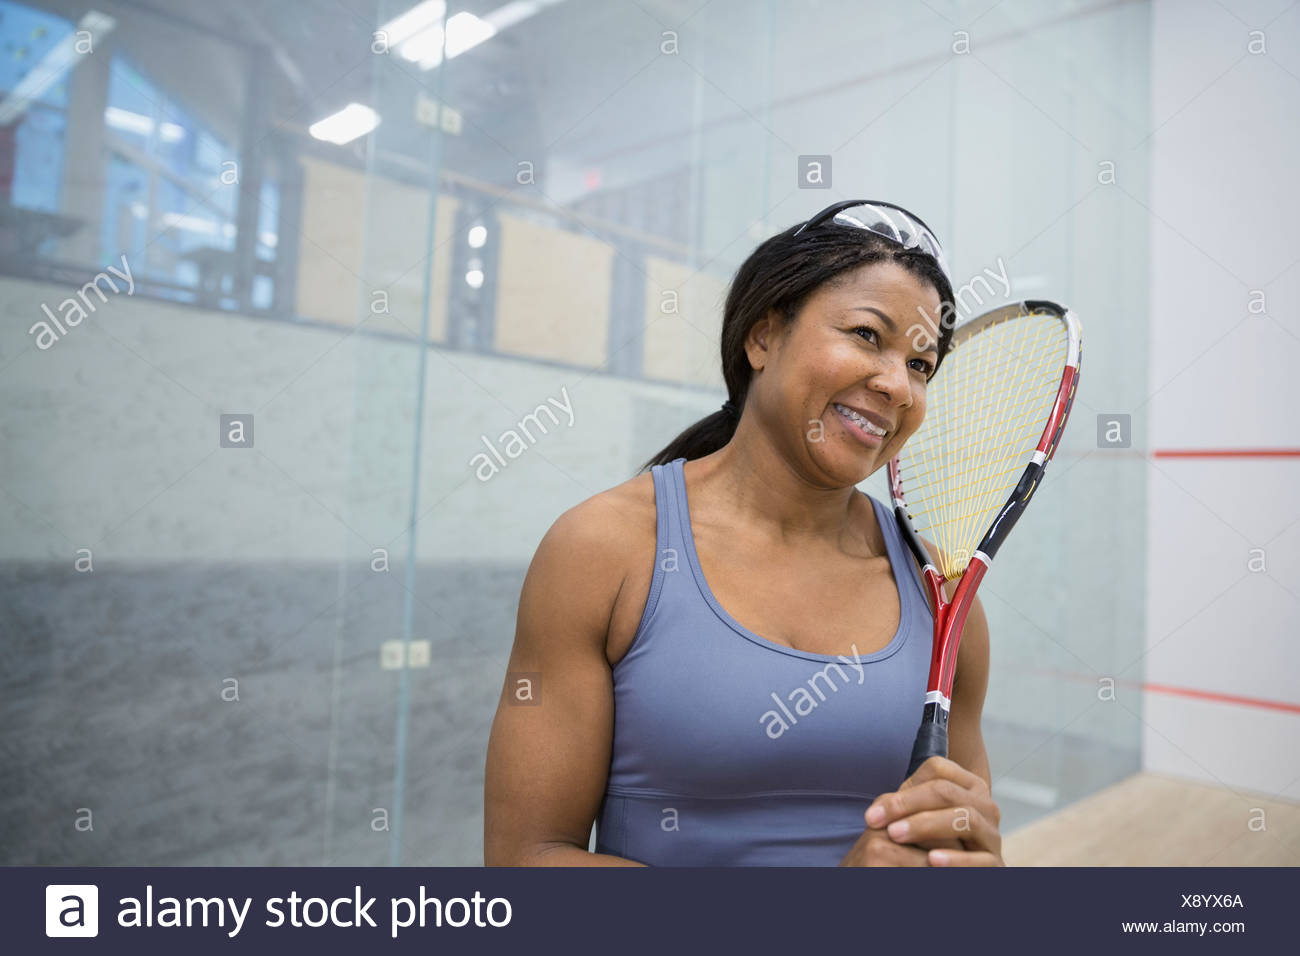 Smiling woman holding squash racket Photo Stock